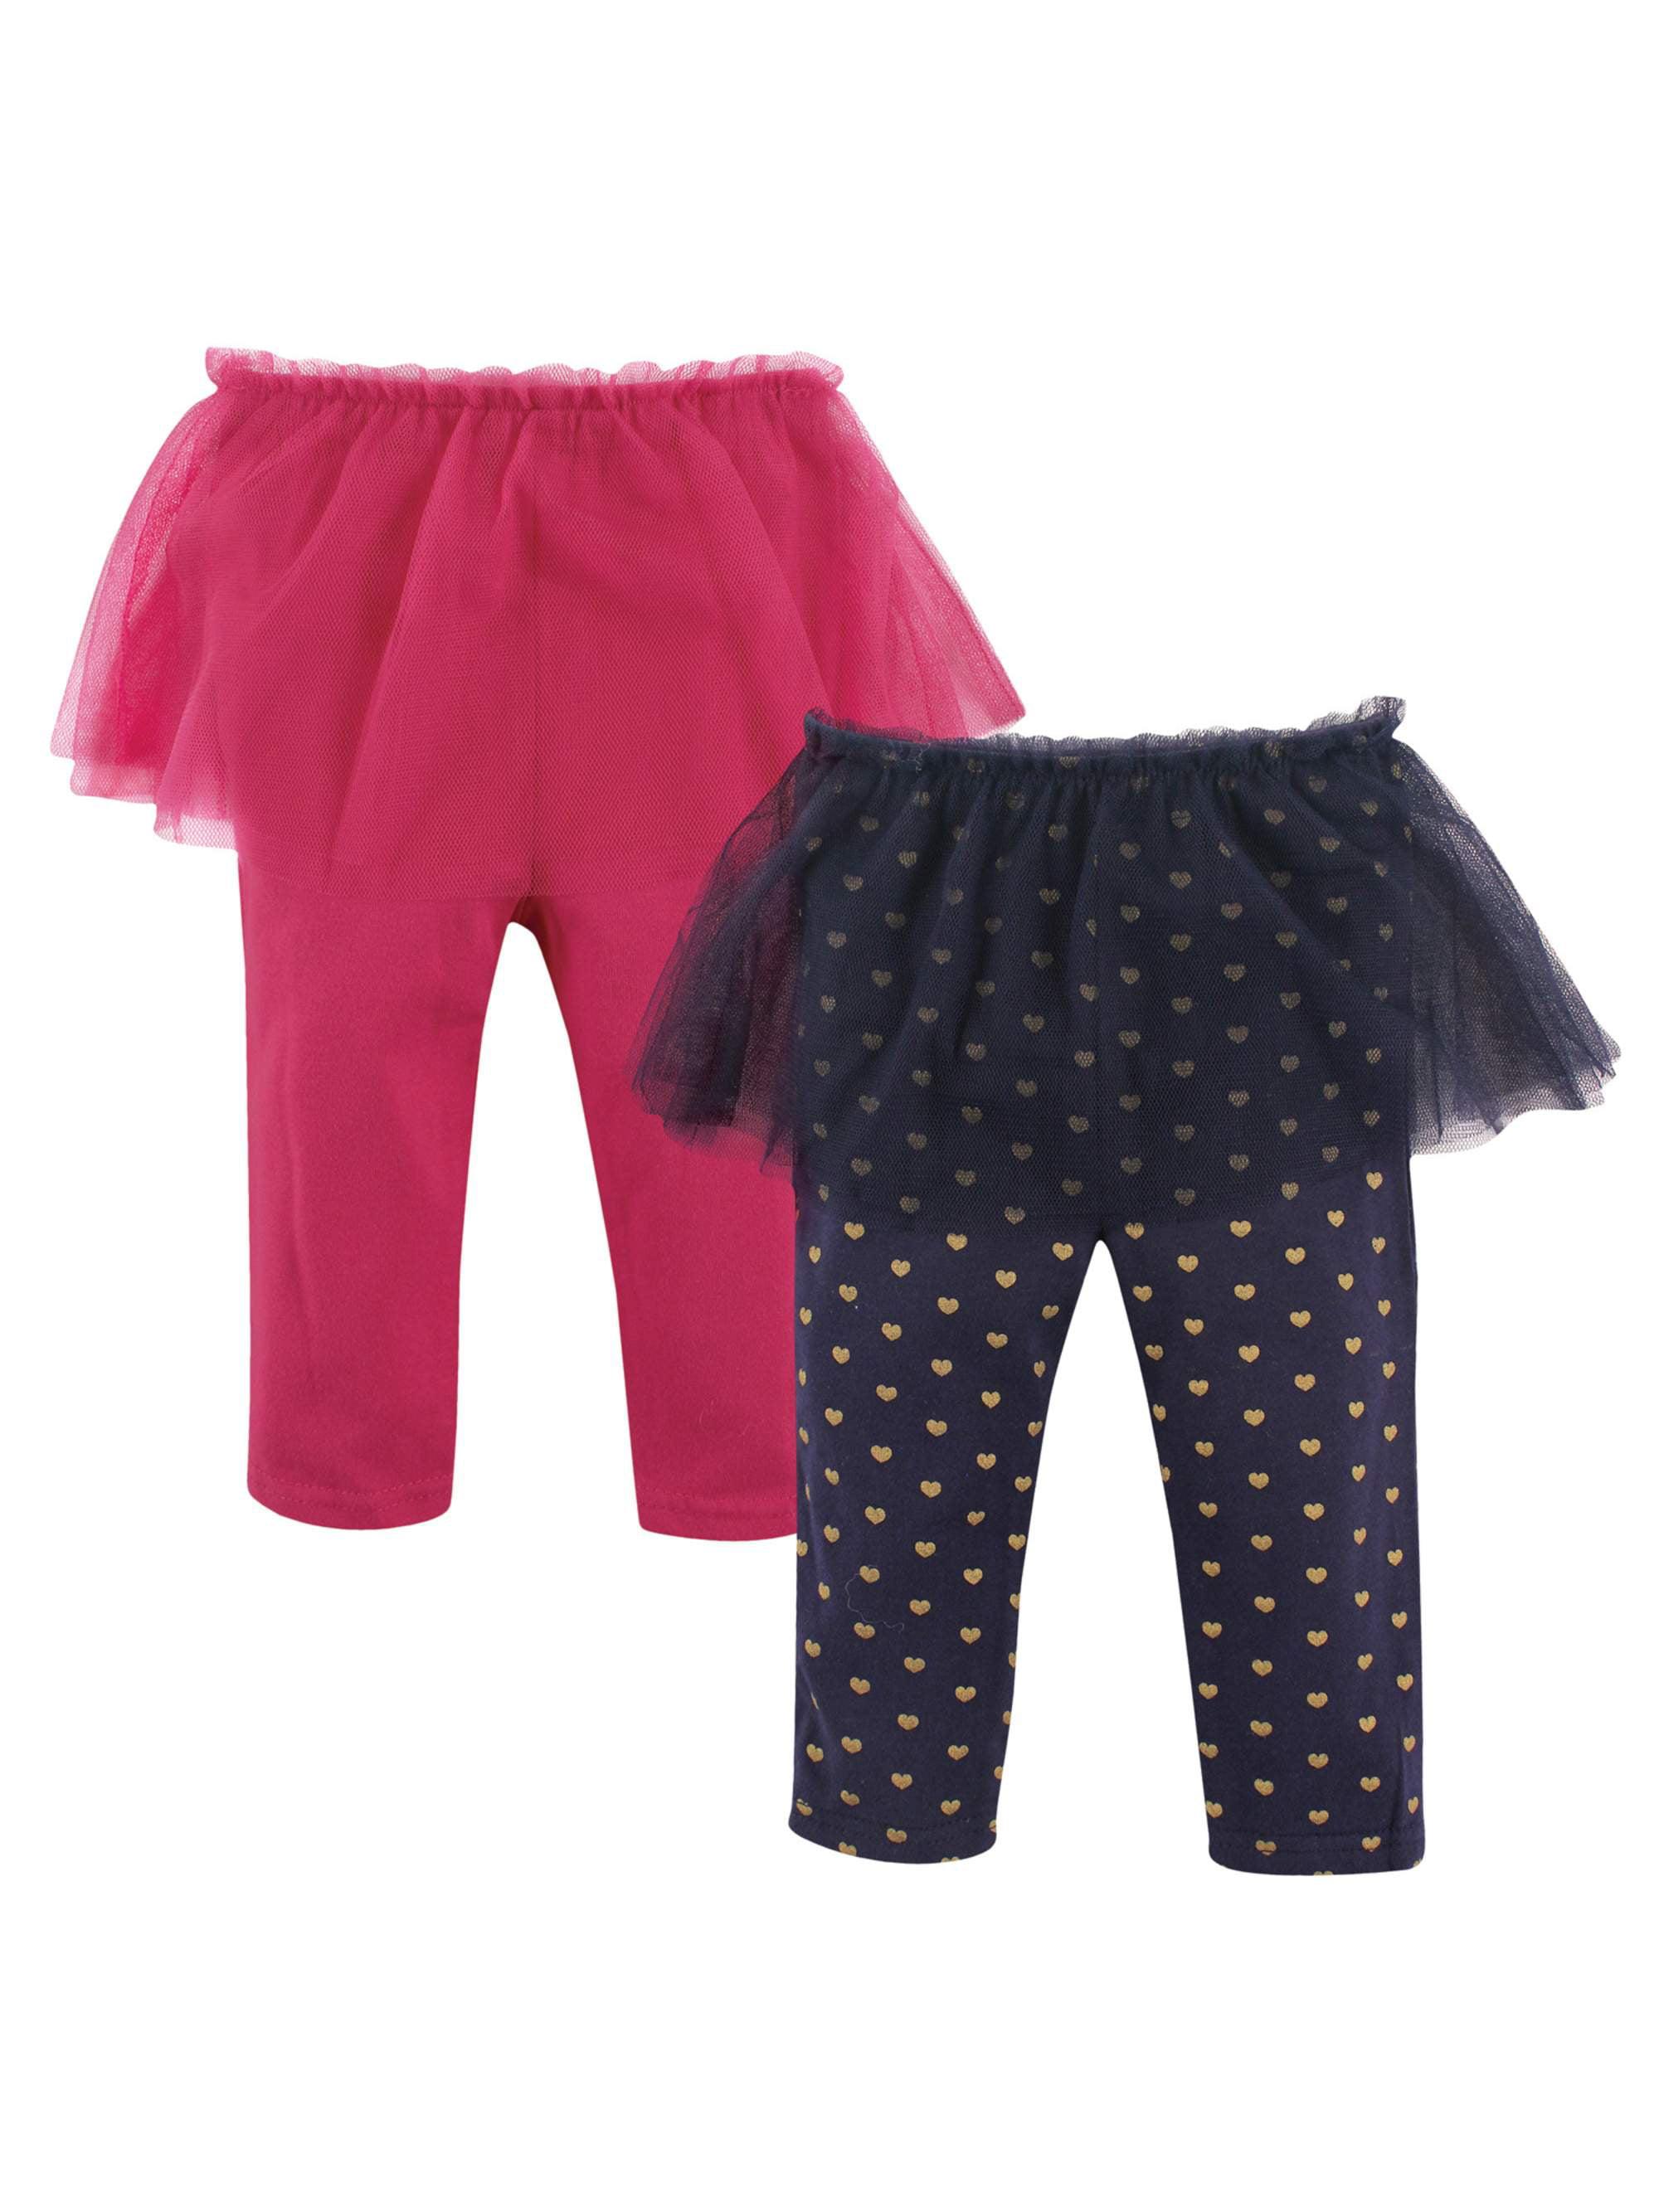 Girl Tutu Leggings, 2-pack